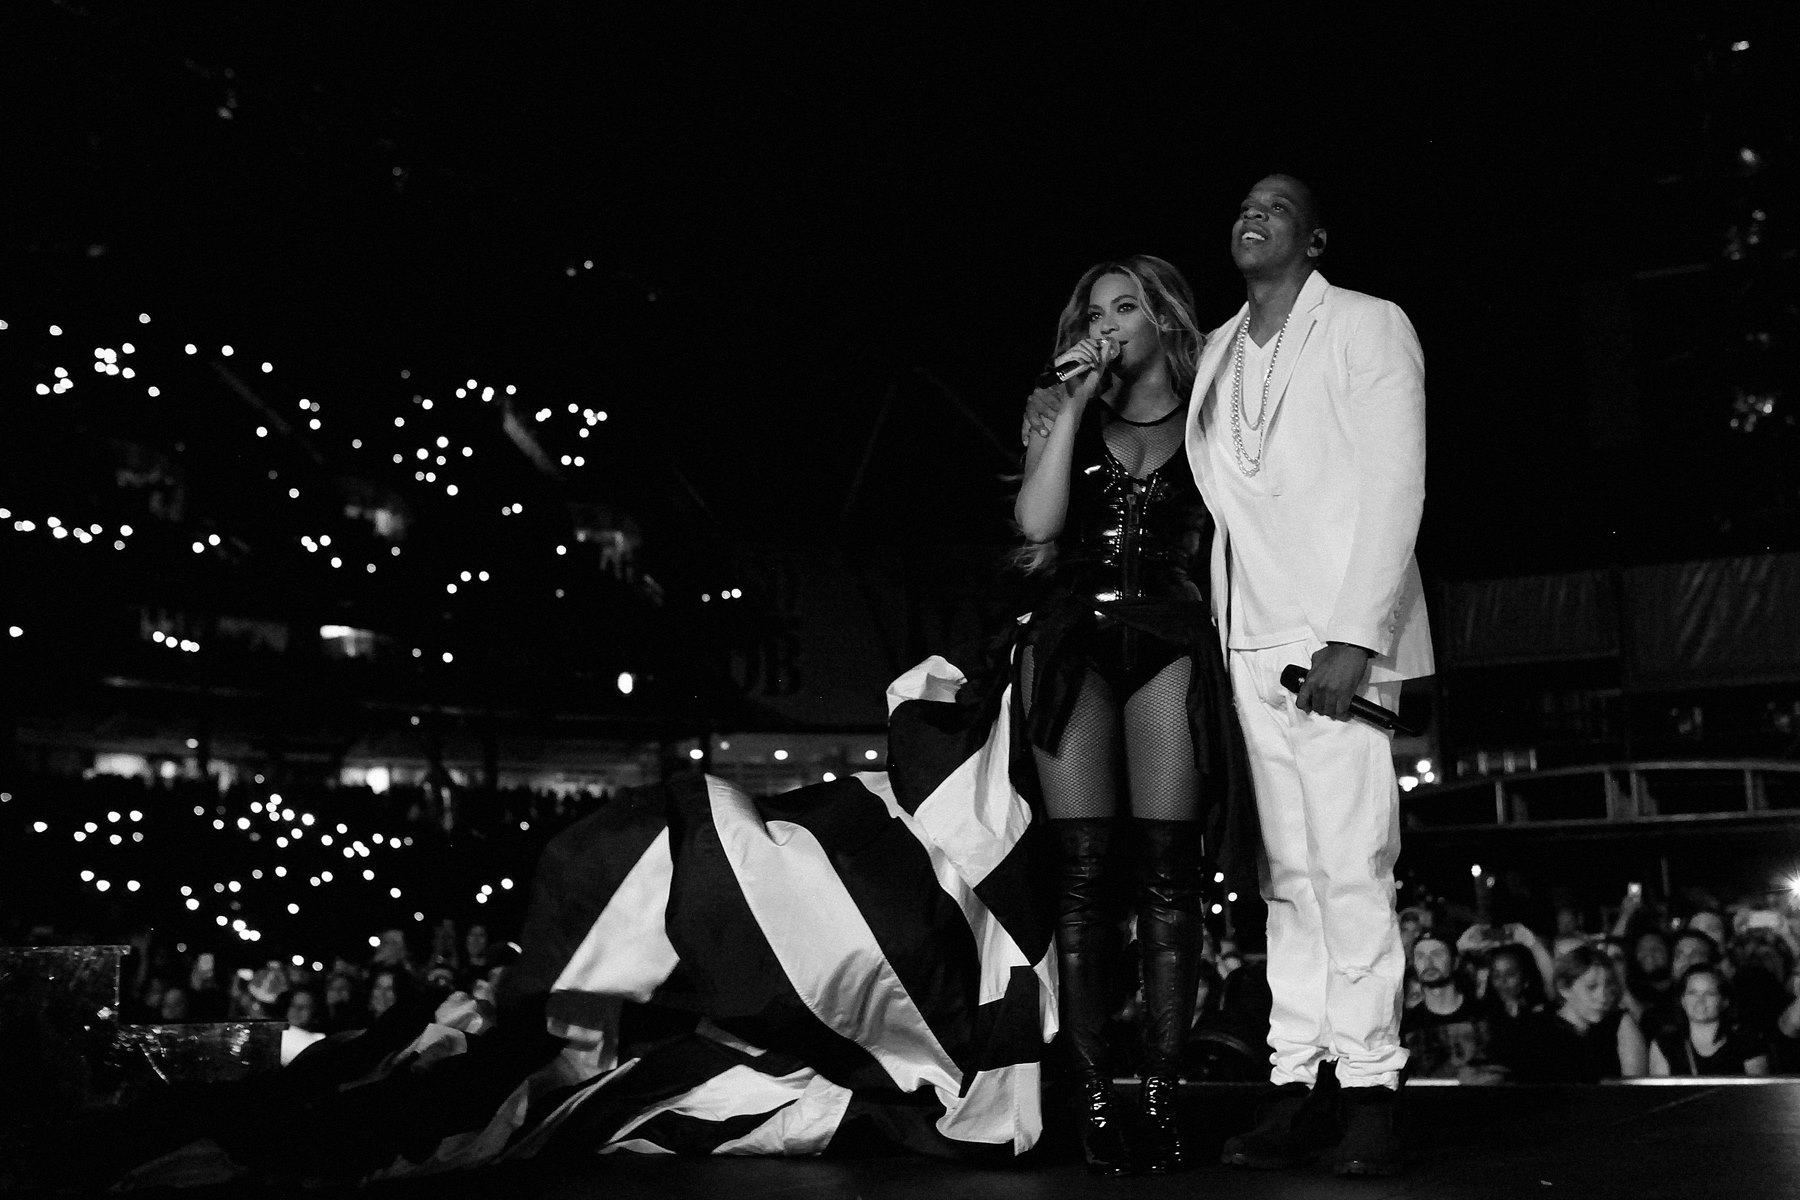 On the Run Tour (Beyoncé and Jay Z)